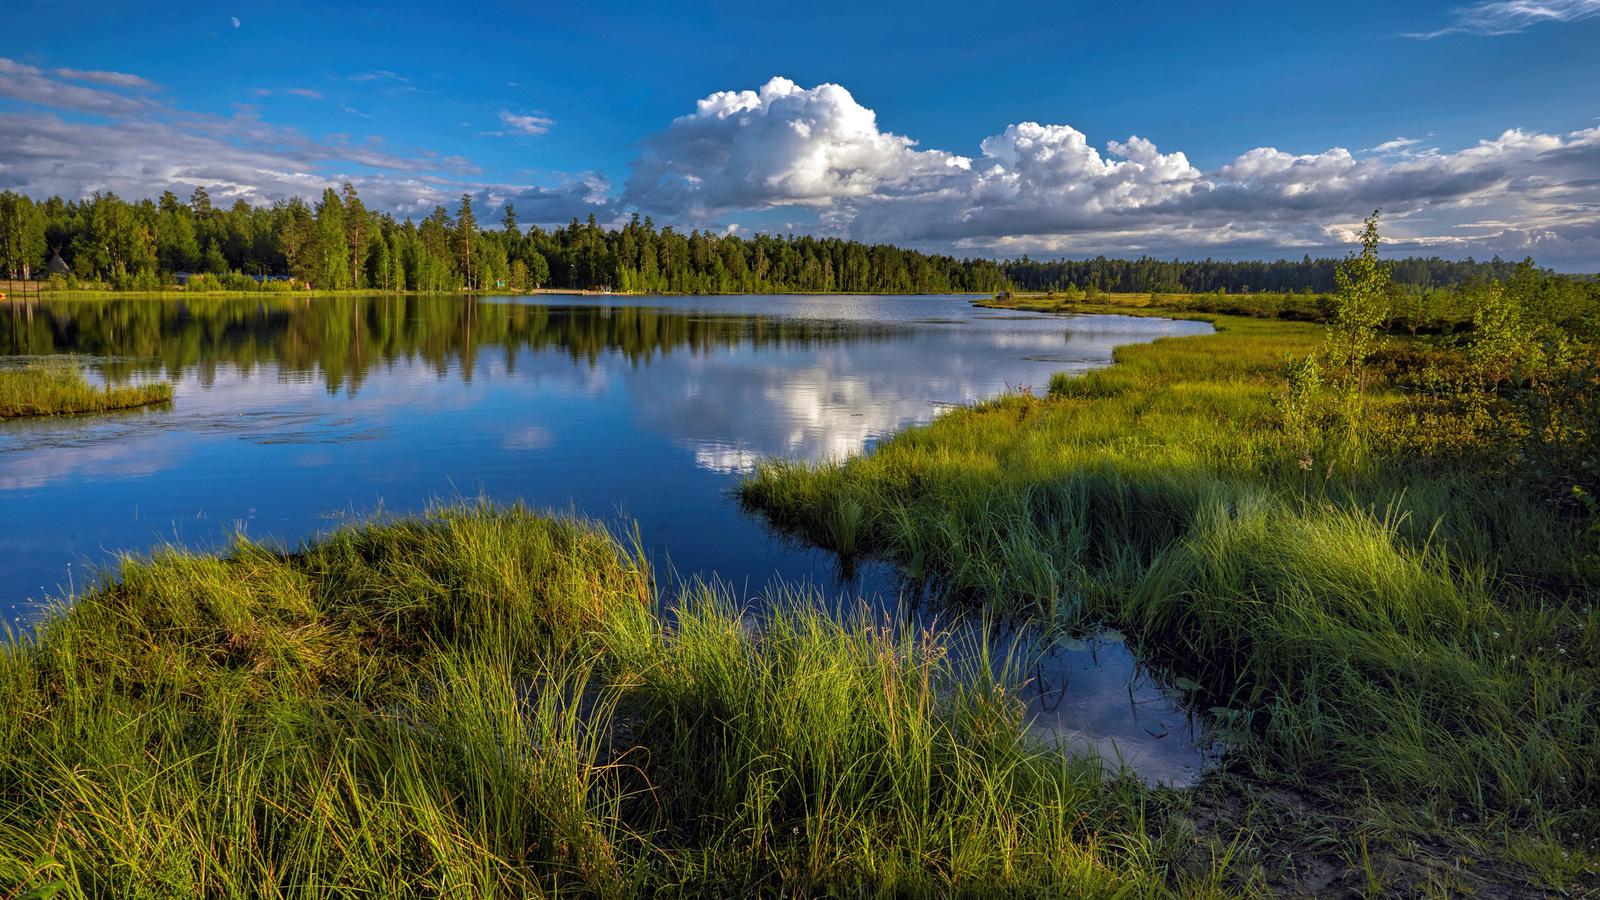 озеро, yugra, tyumen, oblast, трава, природа